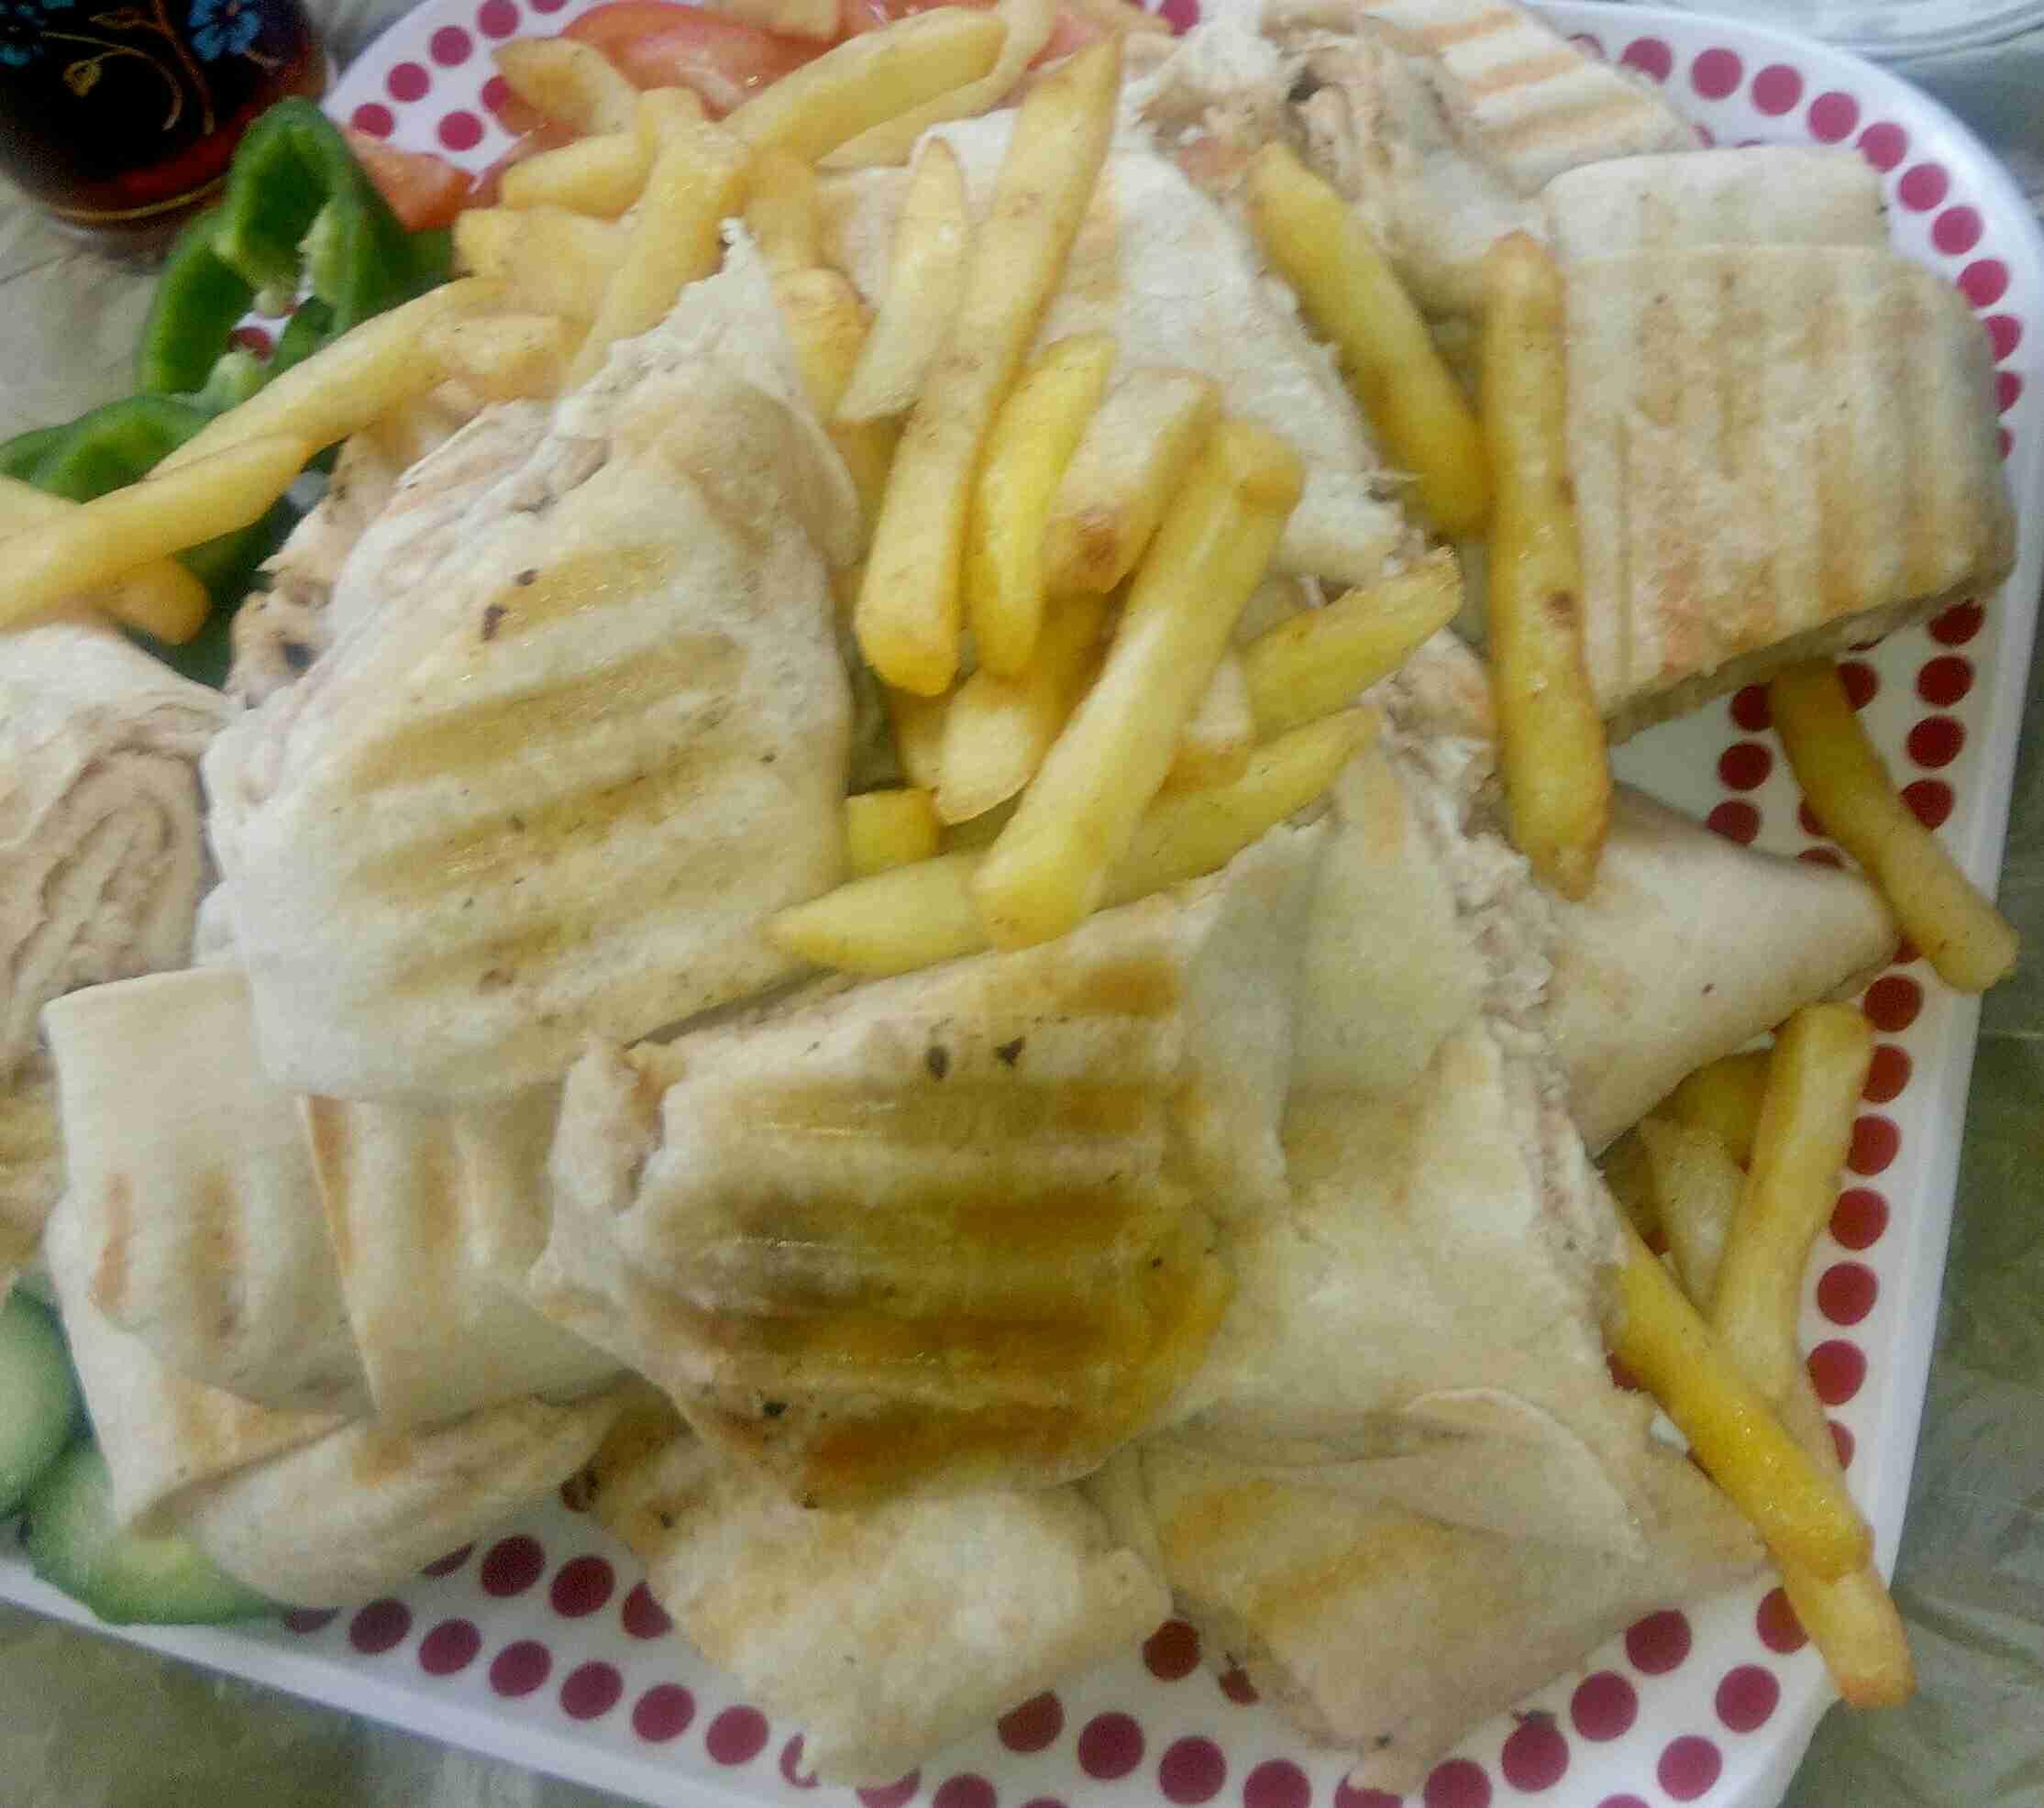 شاورما الدجاج. 😍😍